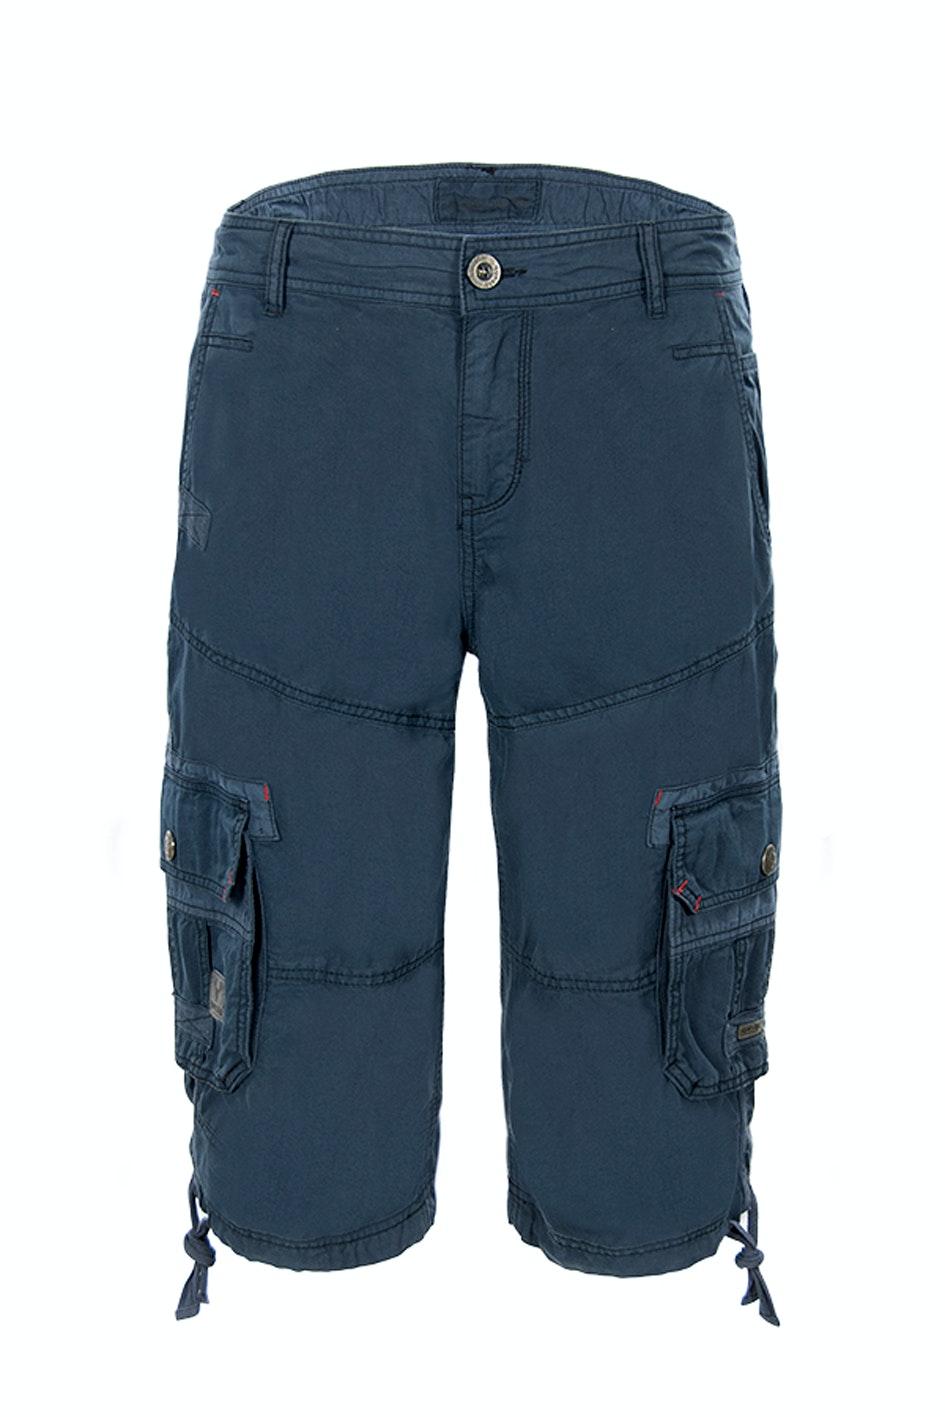 Questo Shorts Andre